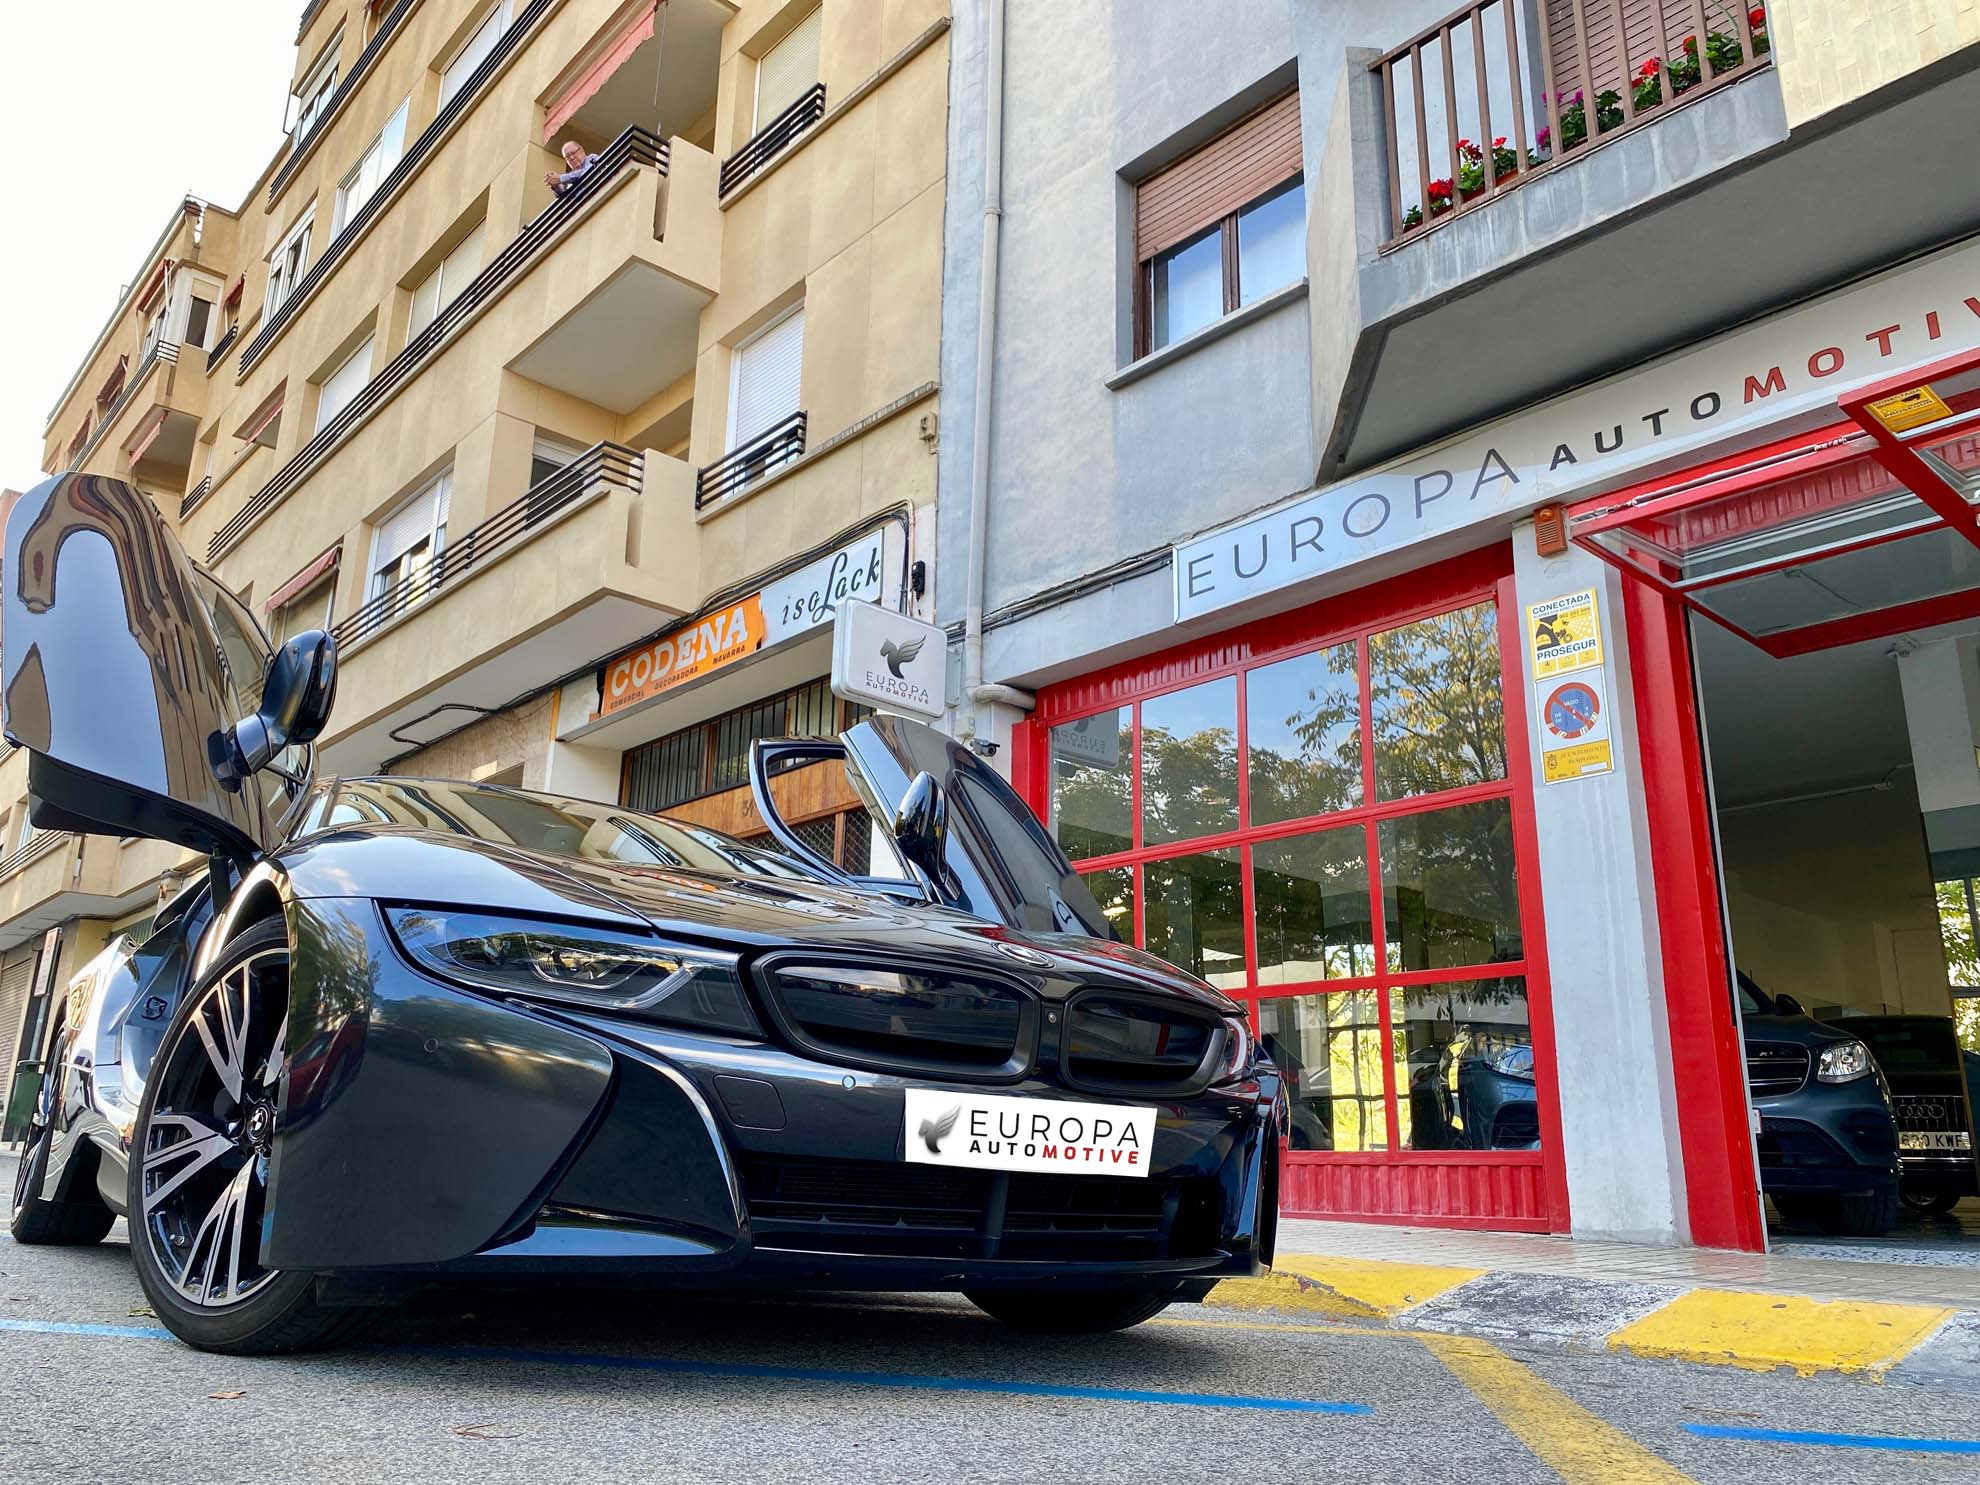 BMW i8 - Europa Automotive - Importador de Coches de Alemania